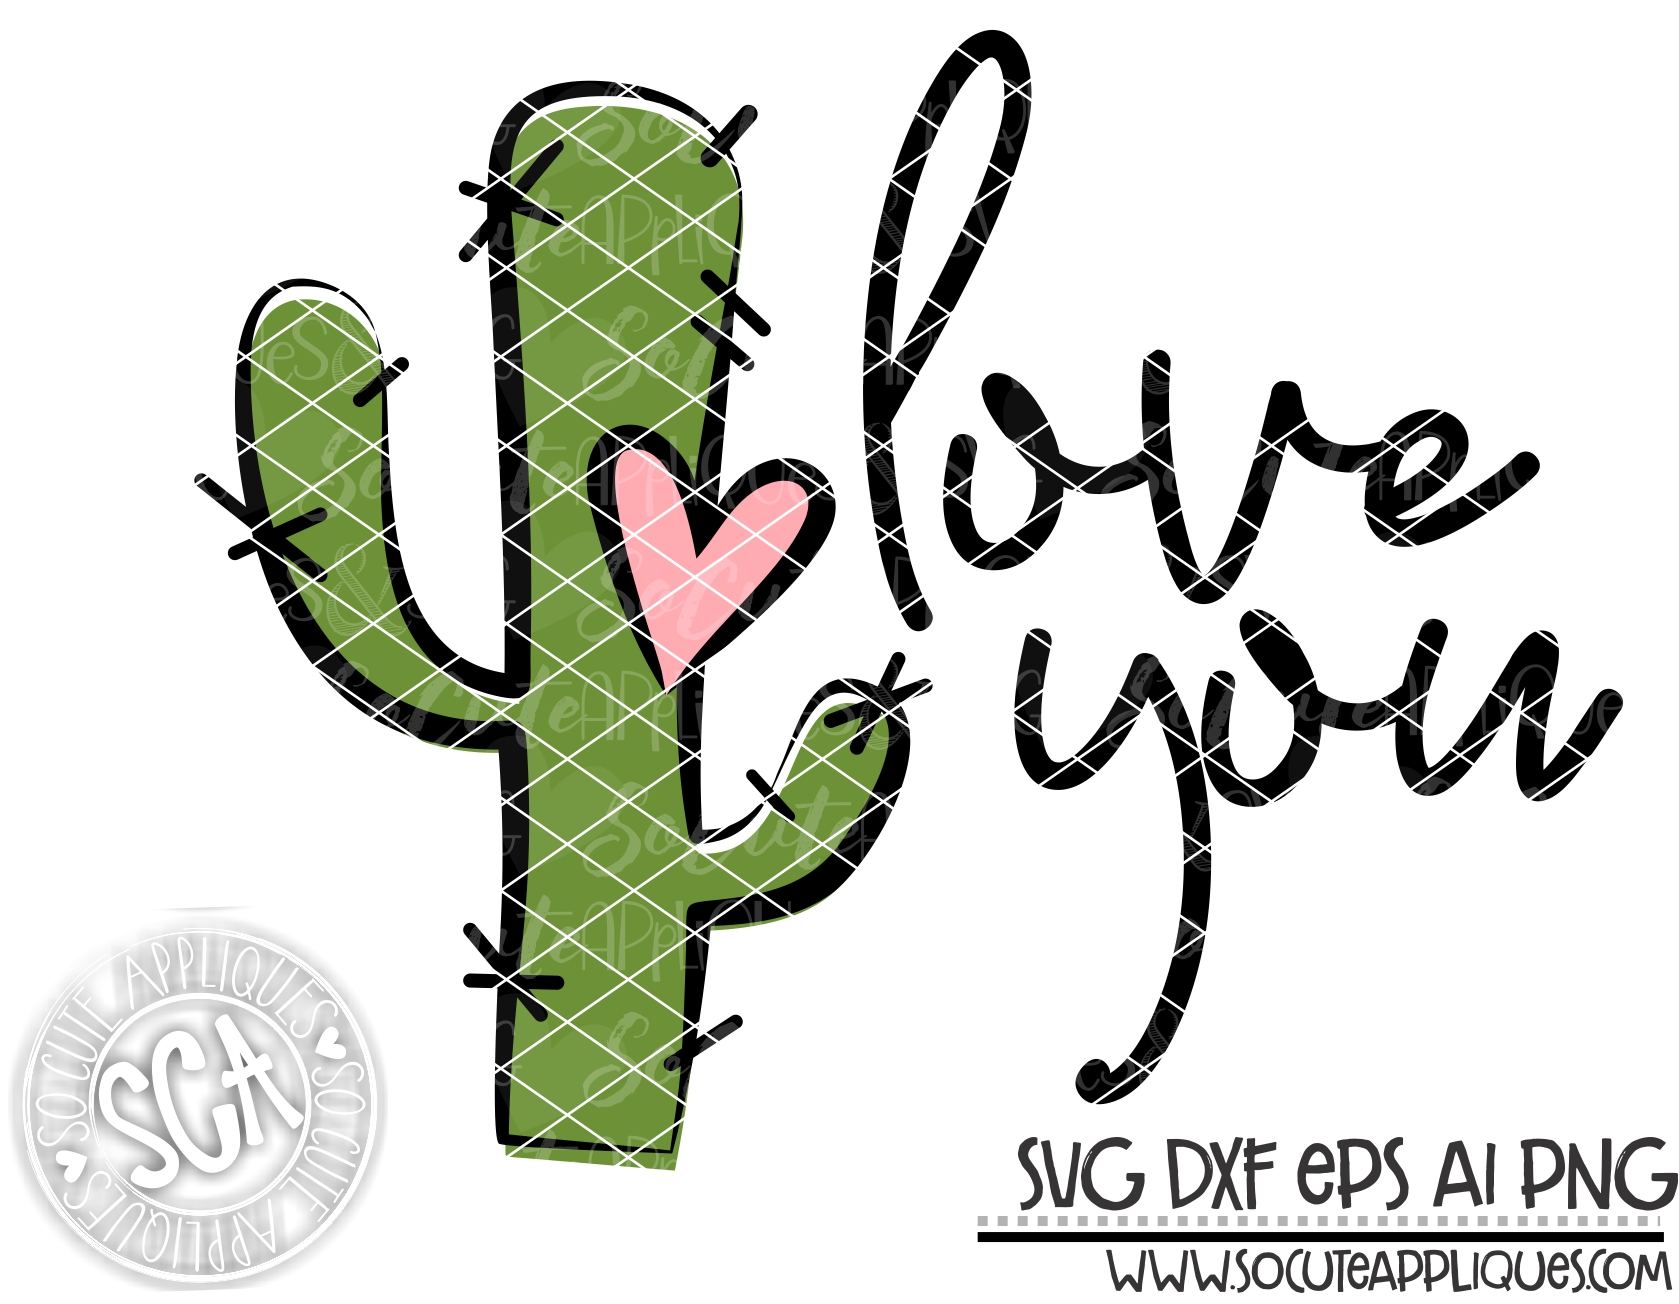 Download love you cactus 18 svg sca - socuteappliques.net